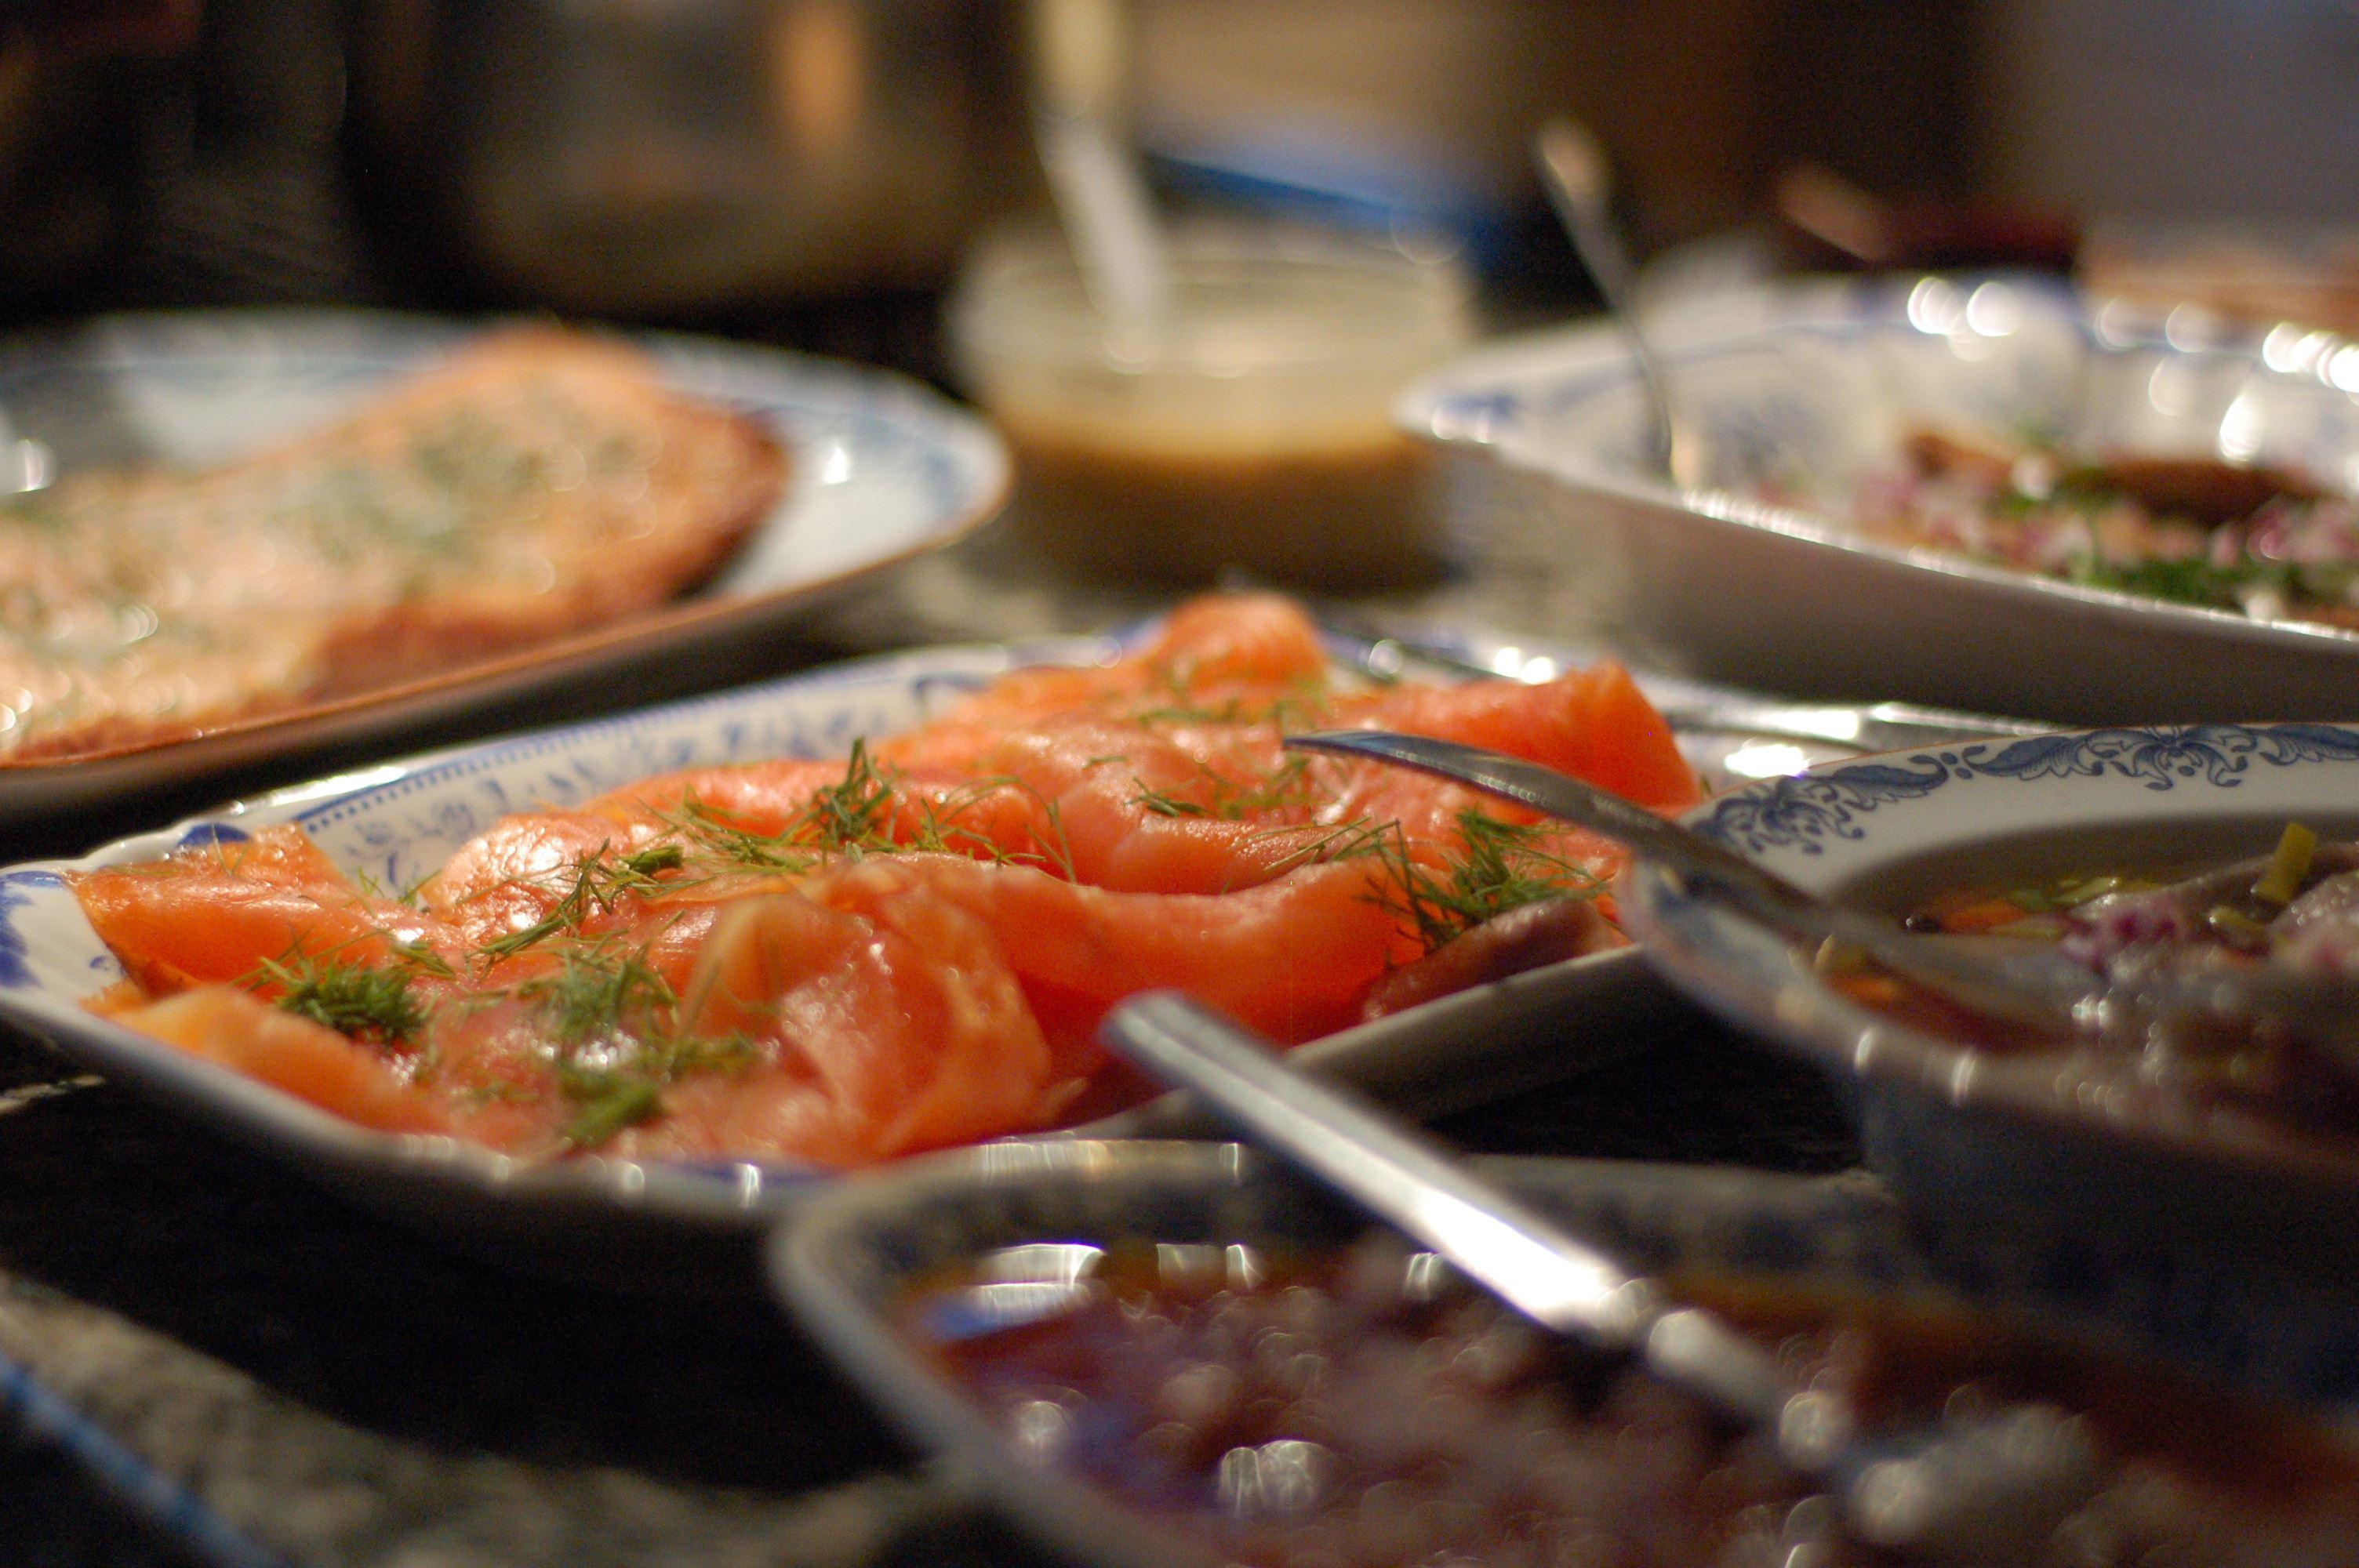 Julbord 2017: Restaurang Torget 1